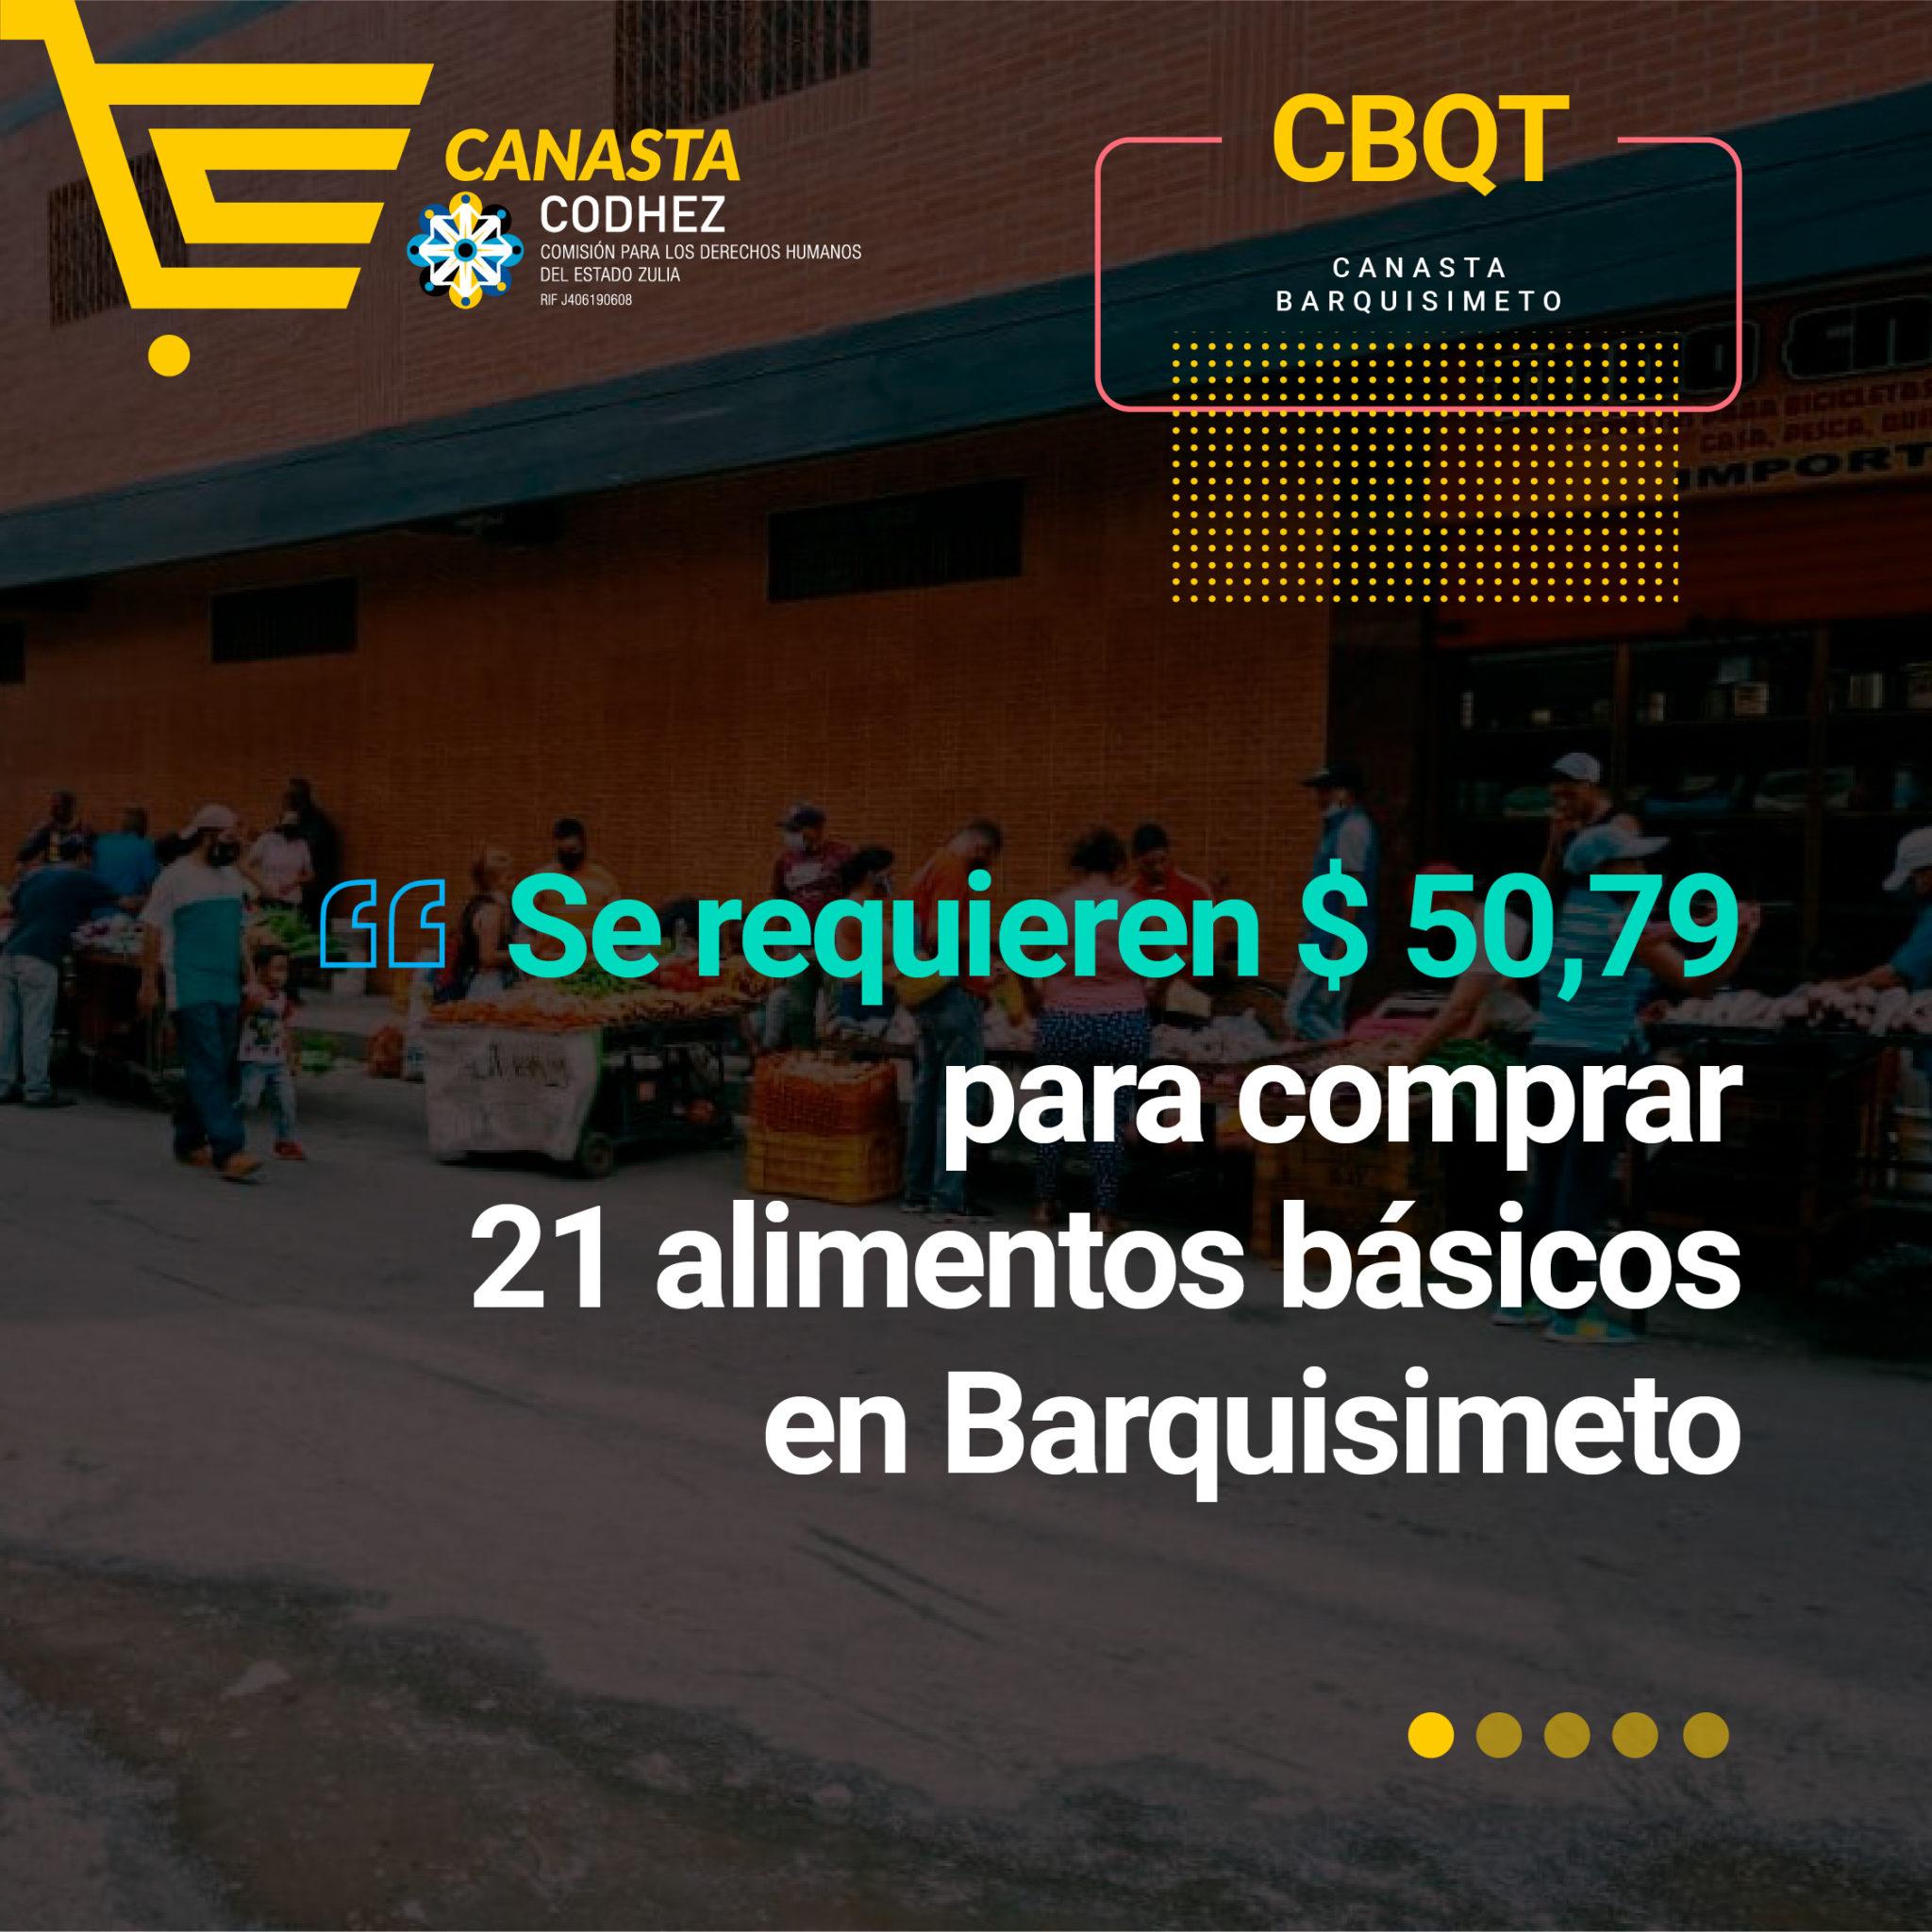 Barquisimetanos requieren 260 sueldos mínimos para adquirir 21 alimentos básicos